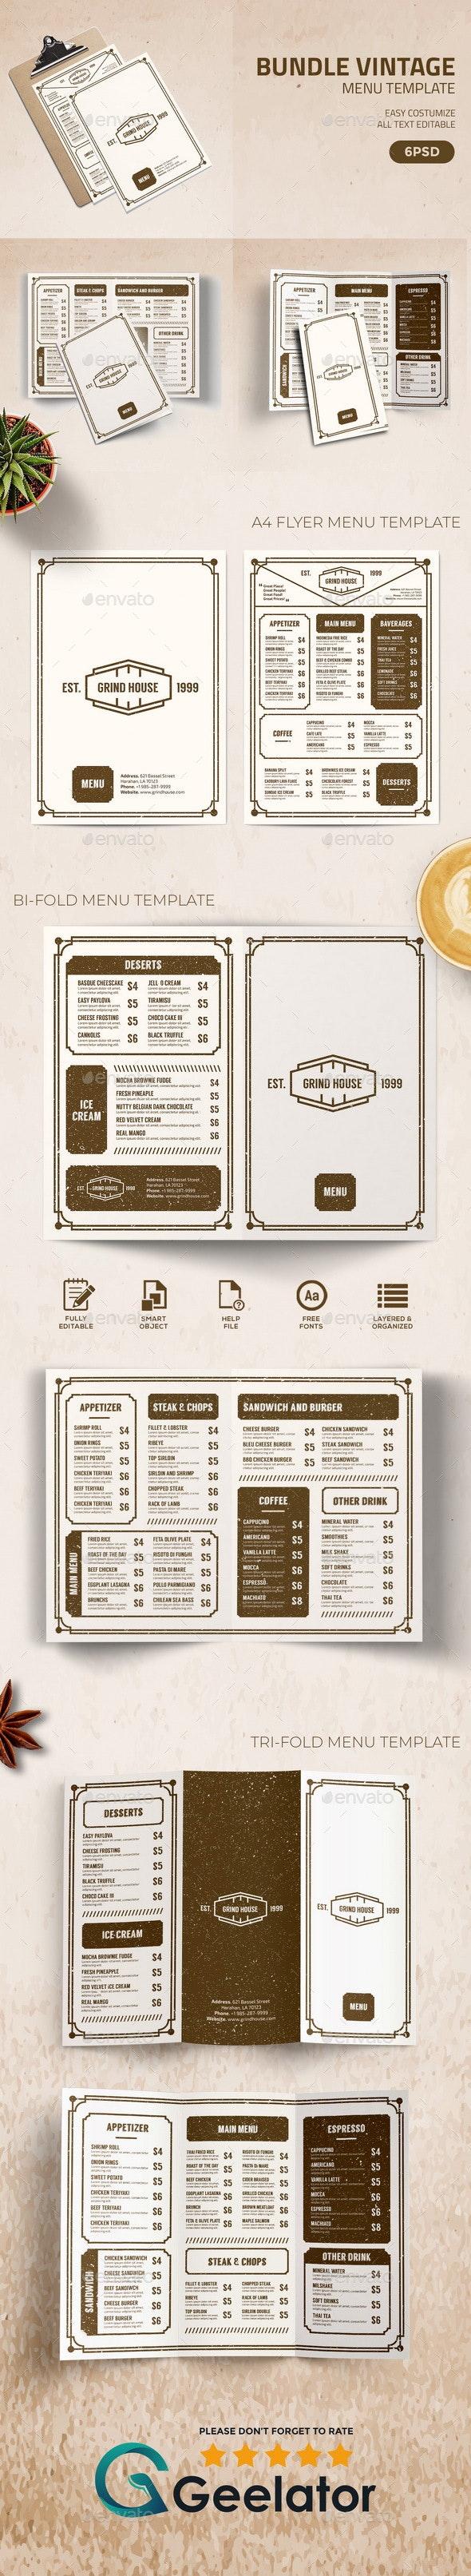 Bundle Vintage Menu Template - Food Menus Print Templates